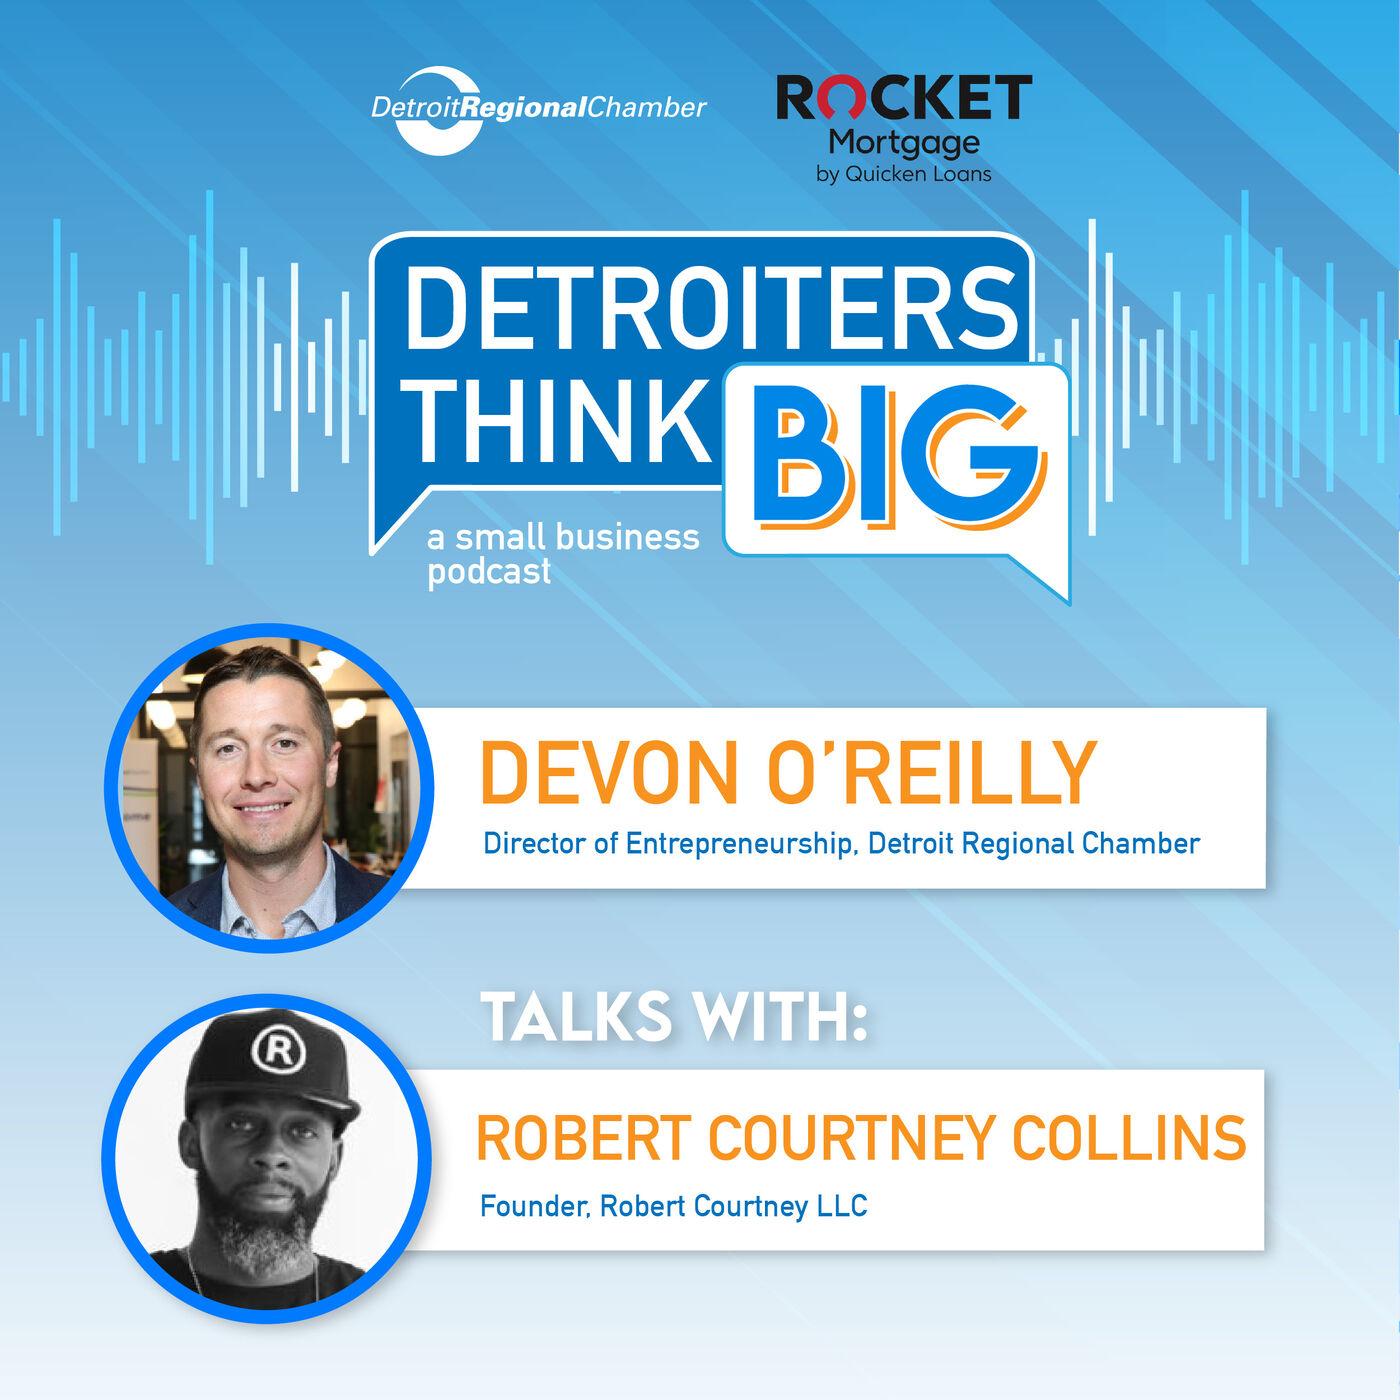 Detroiters Think Big: A Small Business Podcast | Robert Courtney Collins, Robert Courtney LLC